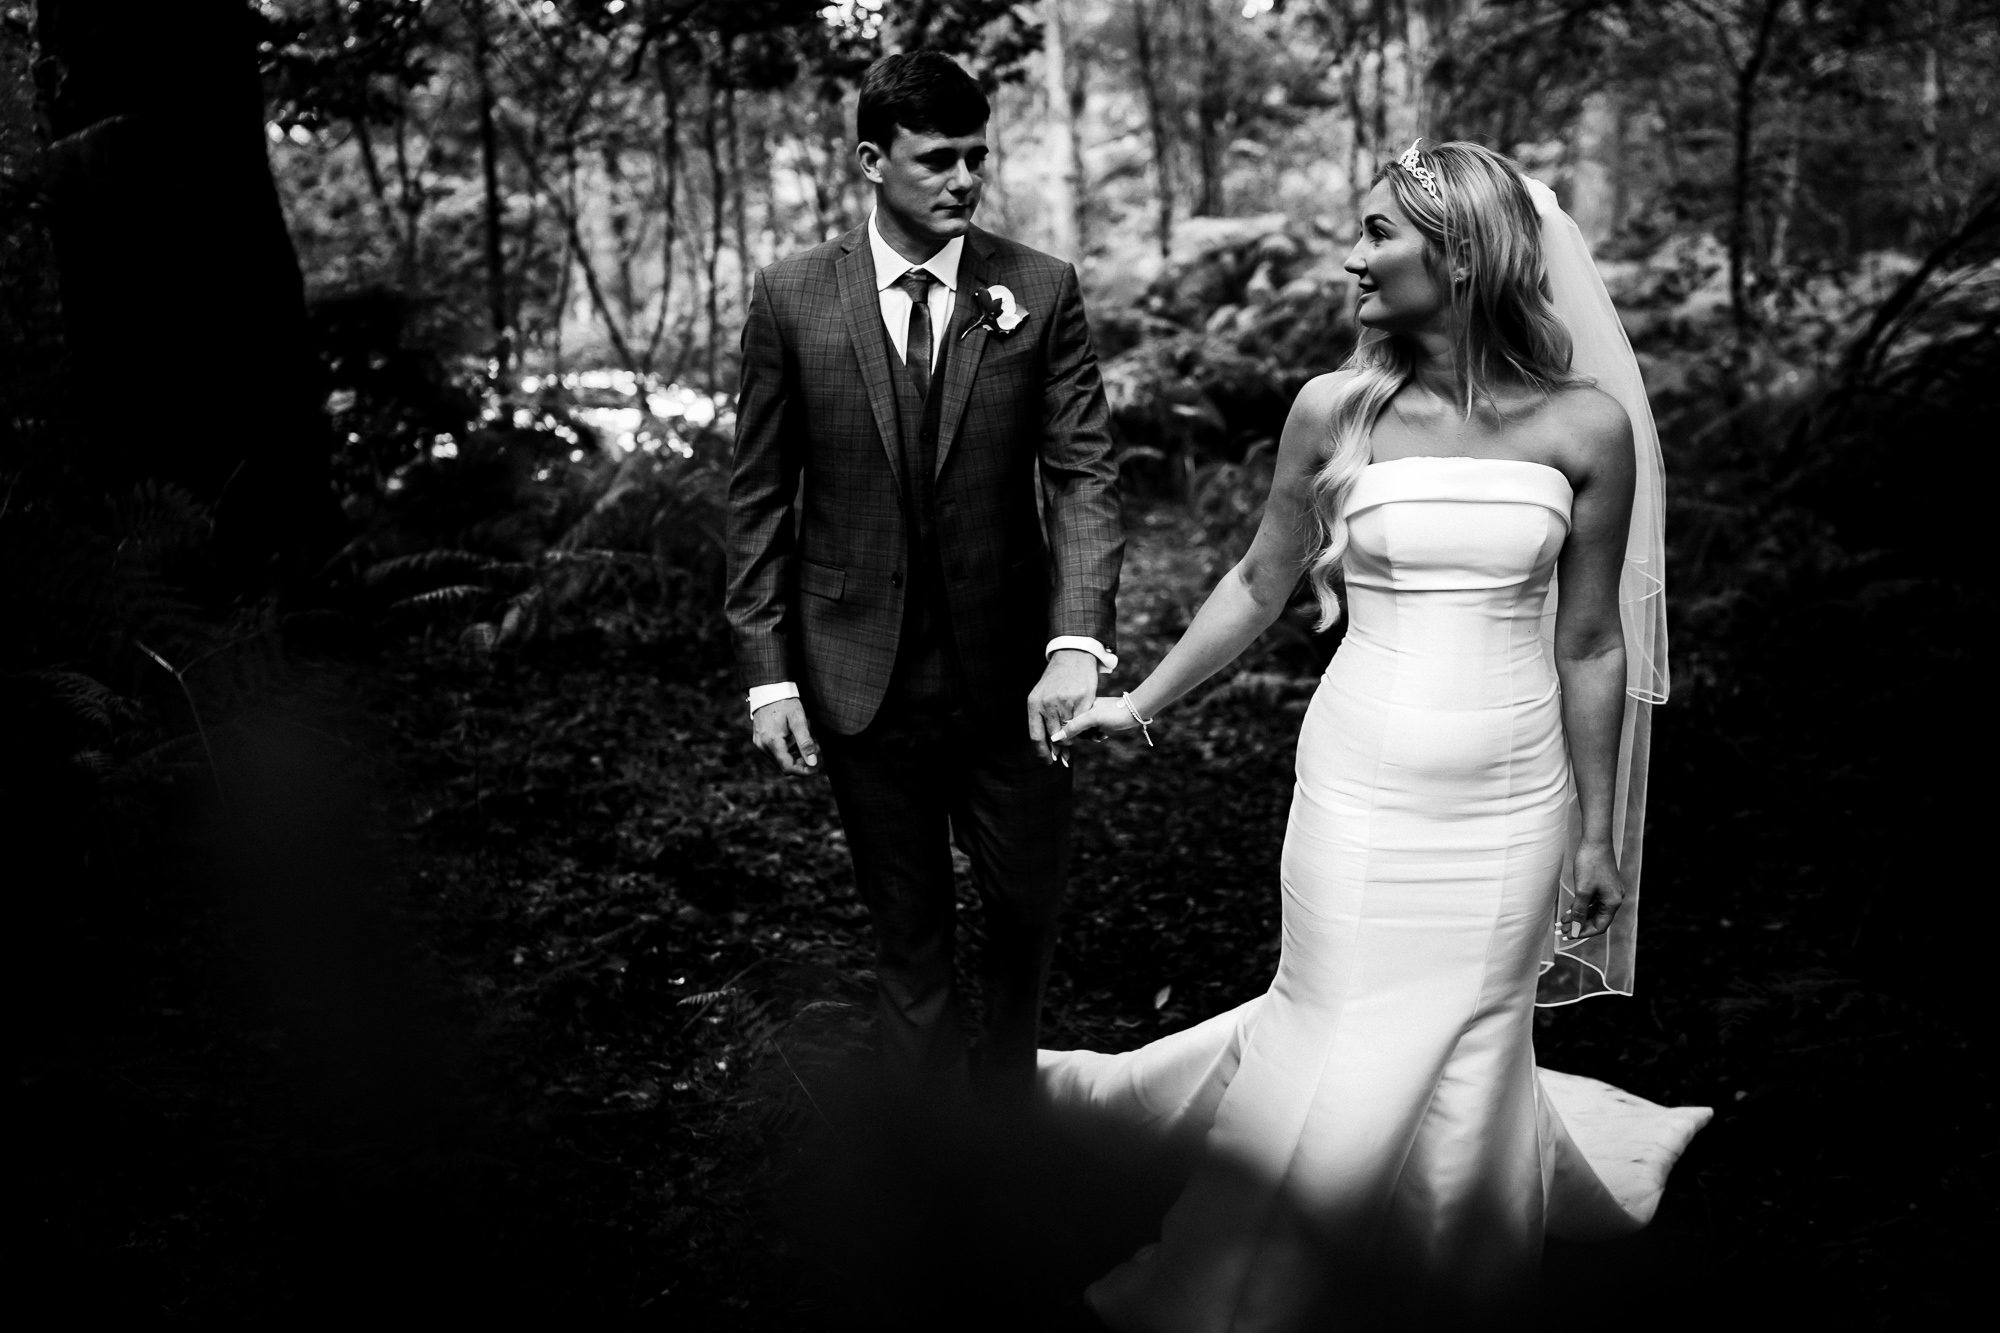 Peckforton Castle wedding photography cheshire wedding photographer (45 of 57).jpg